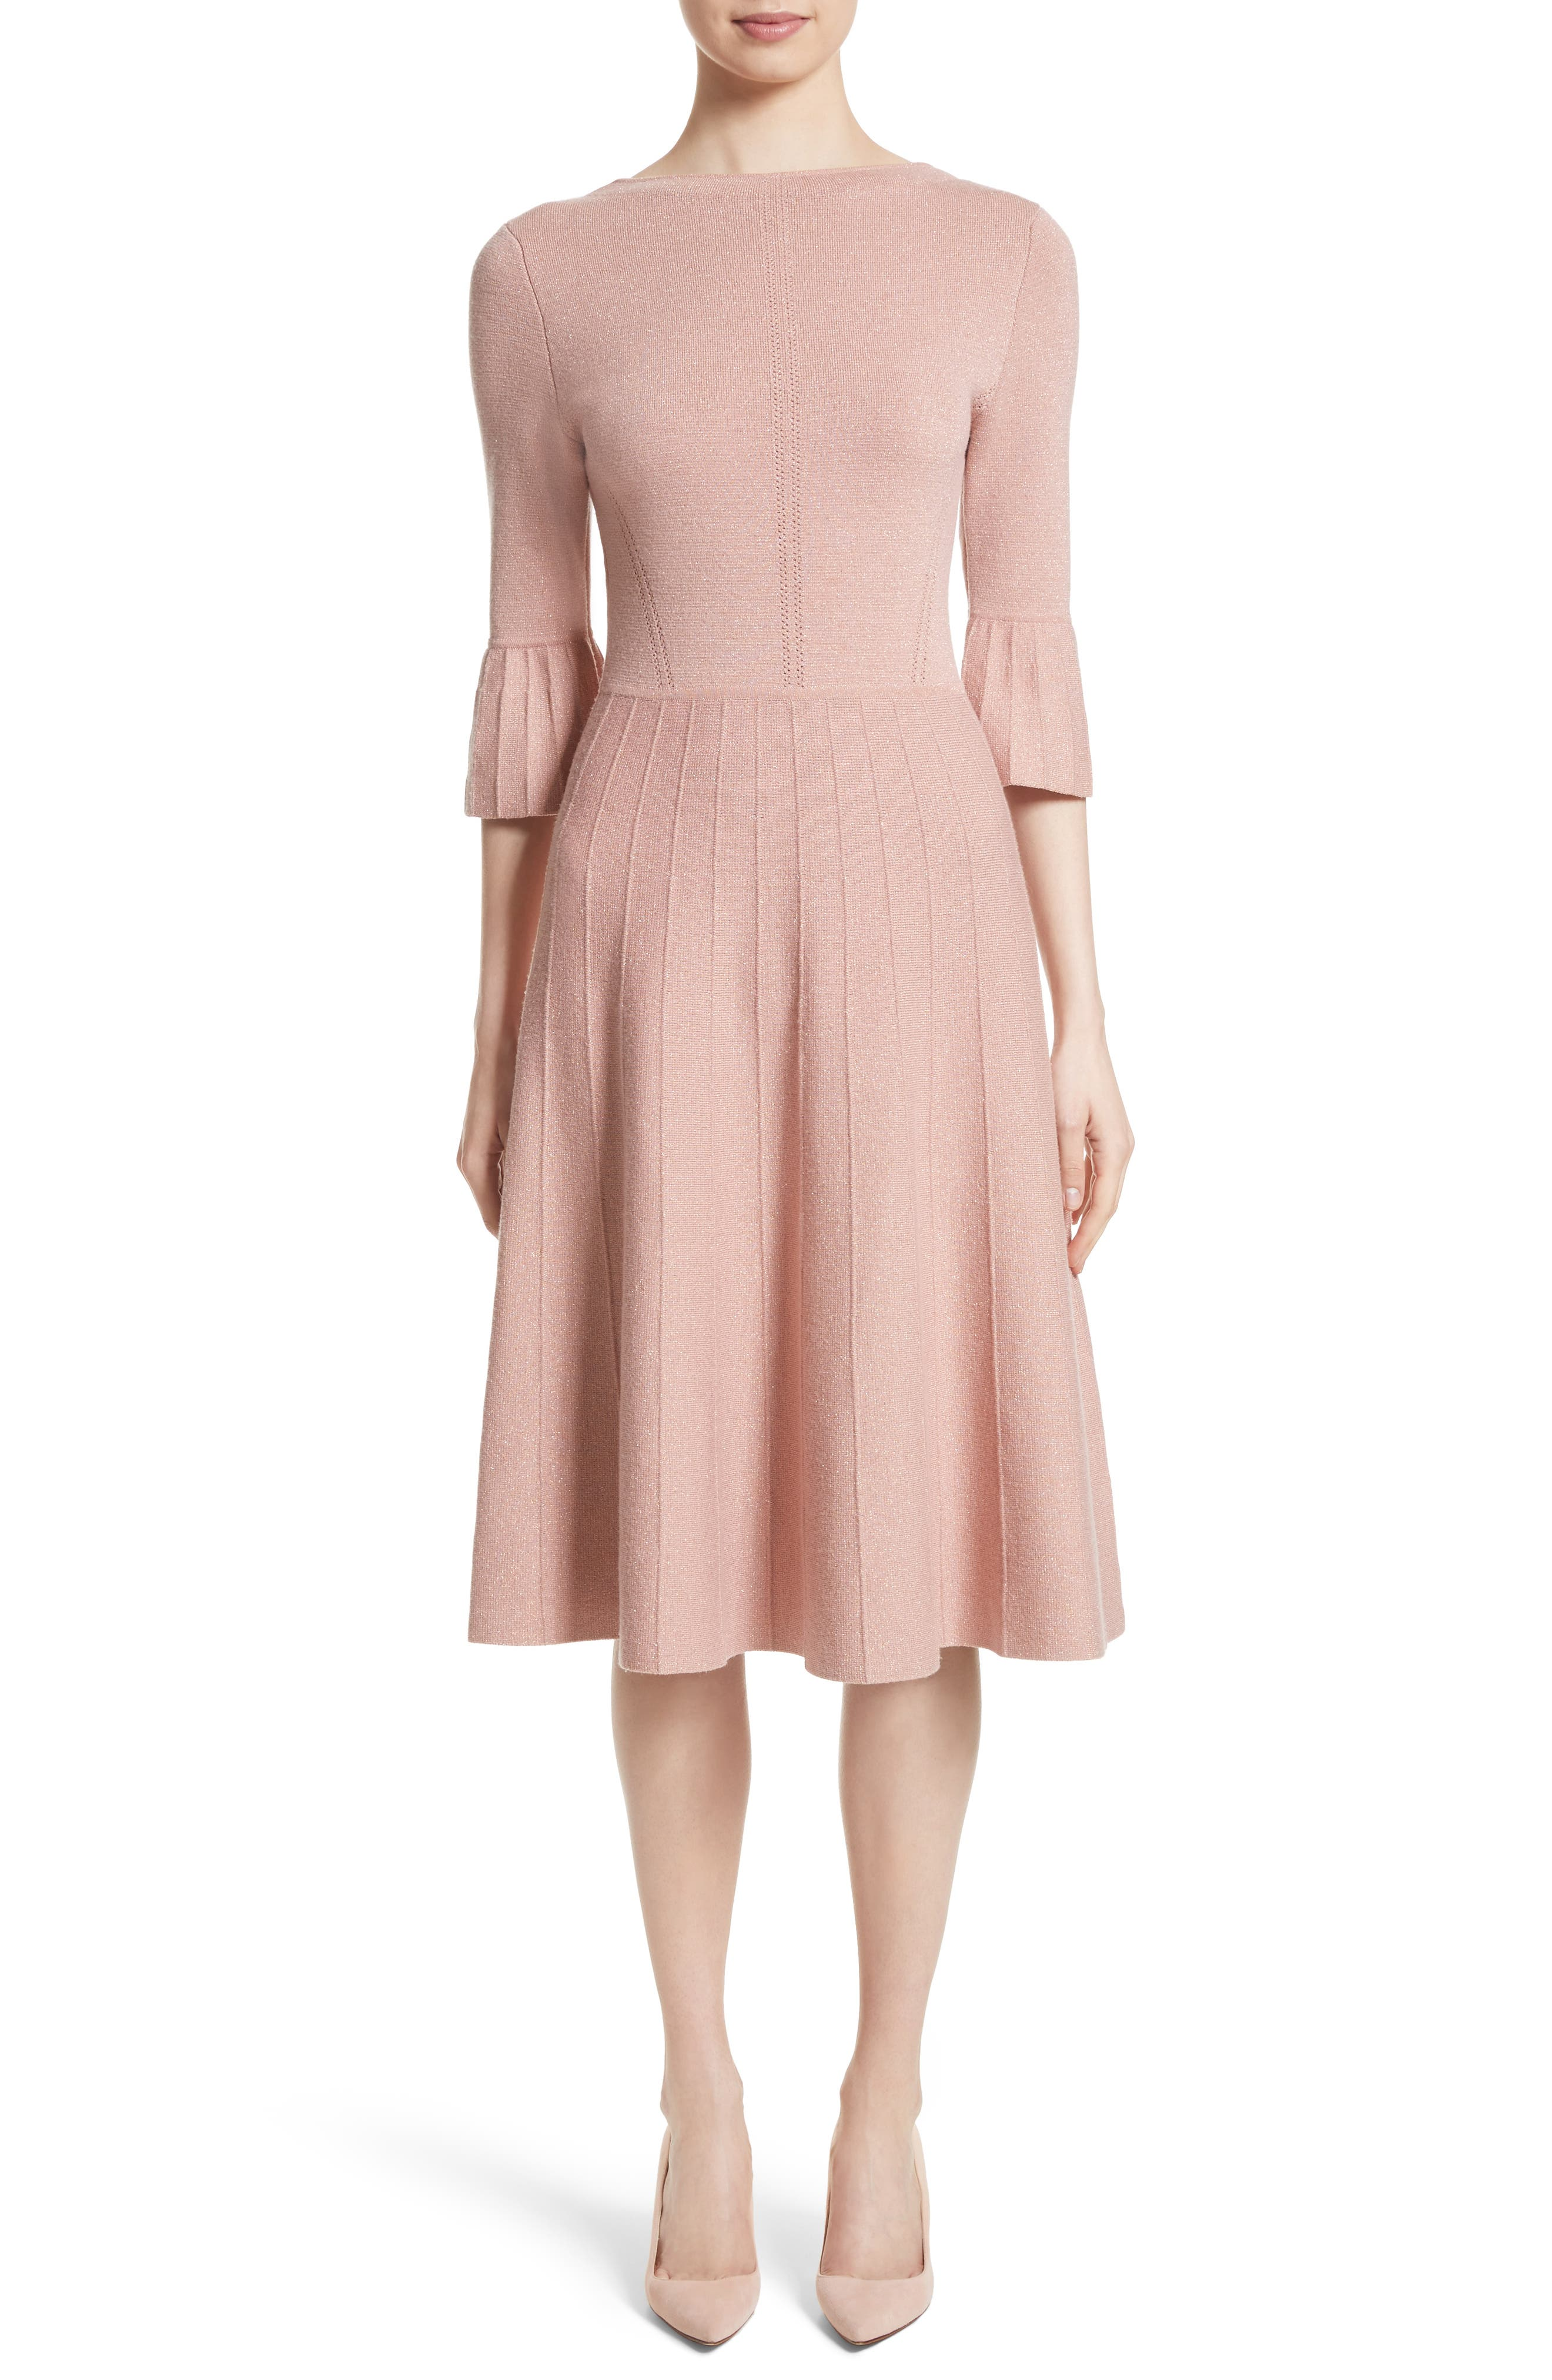 Main Image - Lela Rose Metallic Knit Fit & Flare Dress